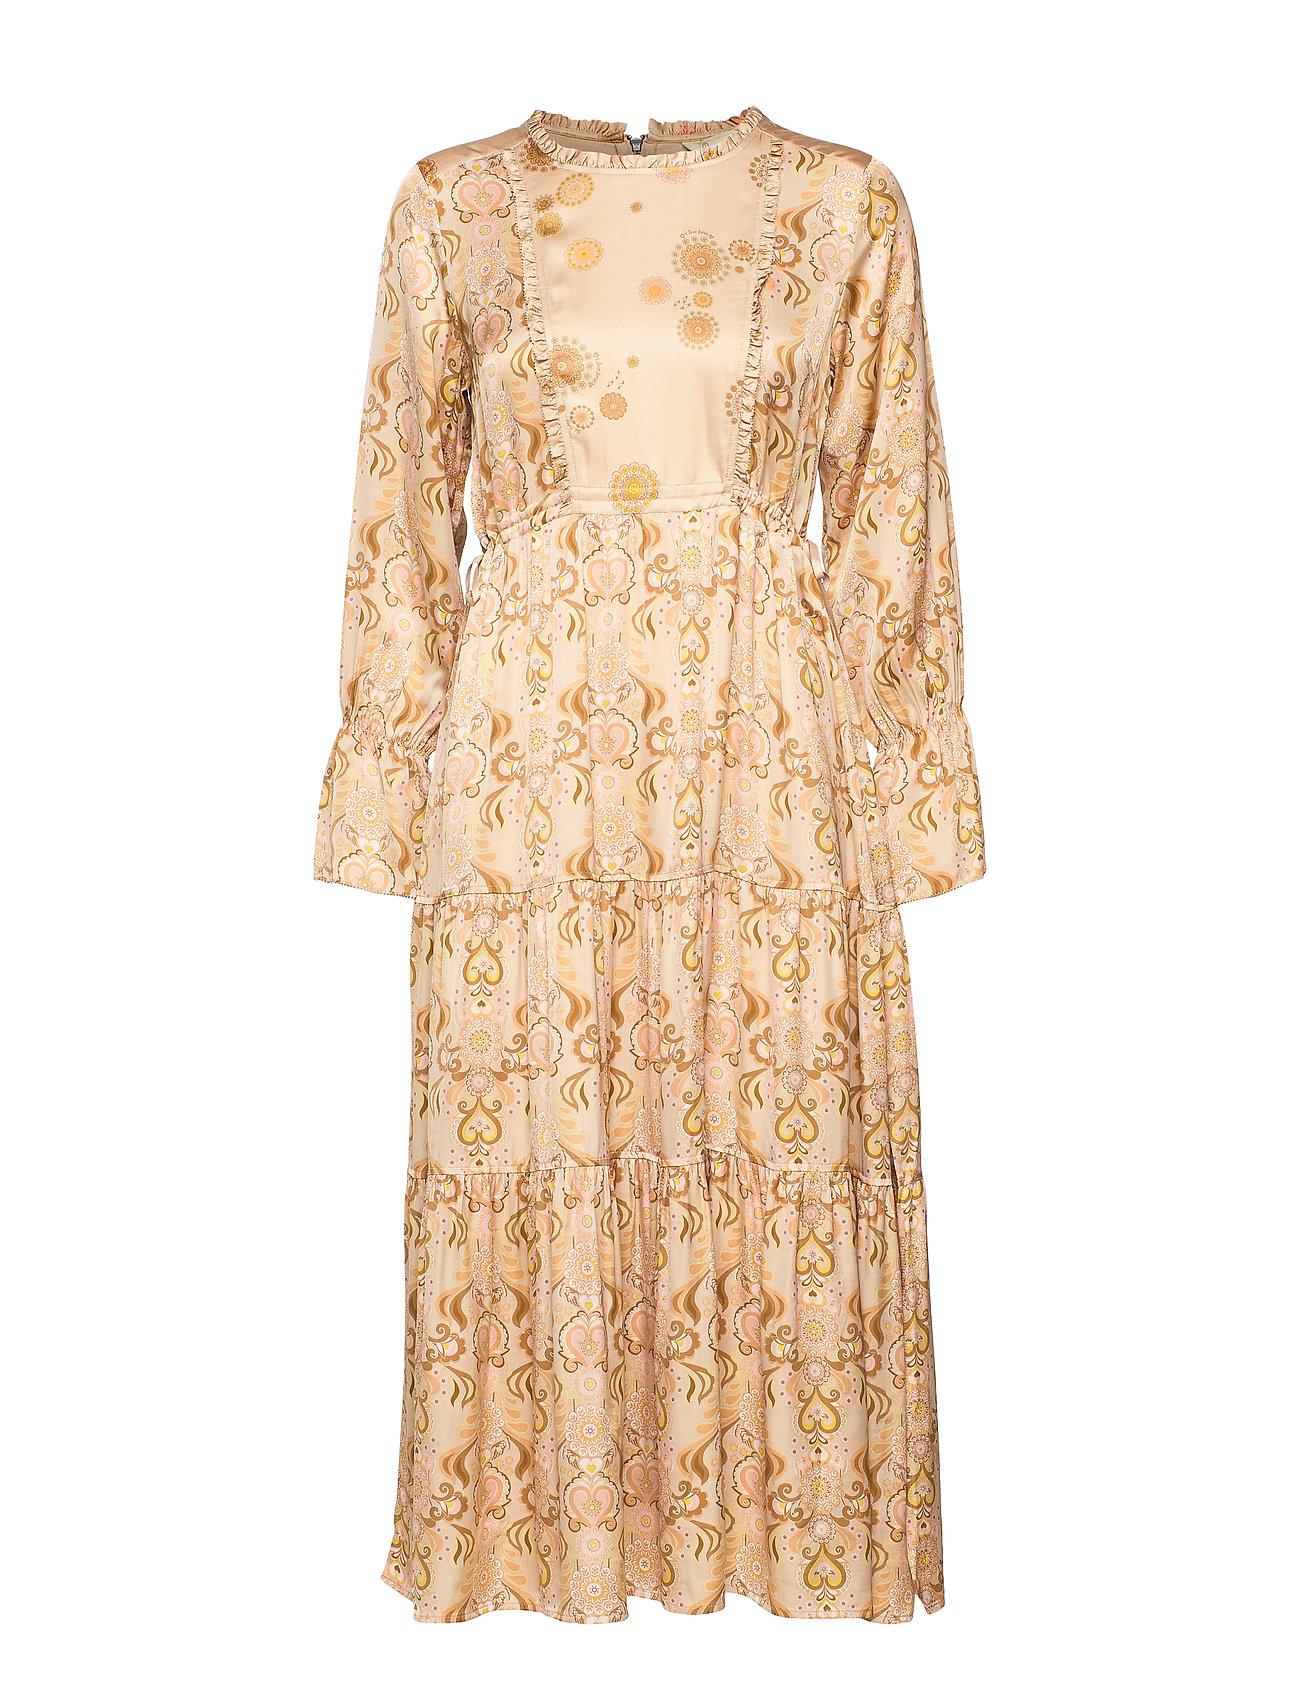 ODD MOLLY My Kind Of Beautiful Dress - LIGHT TAUPE